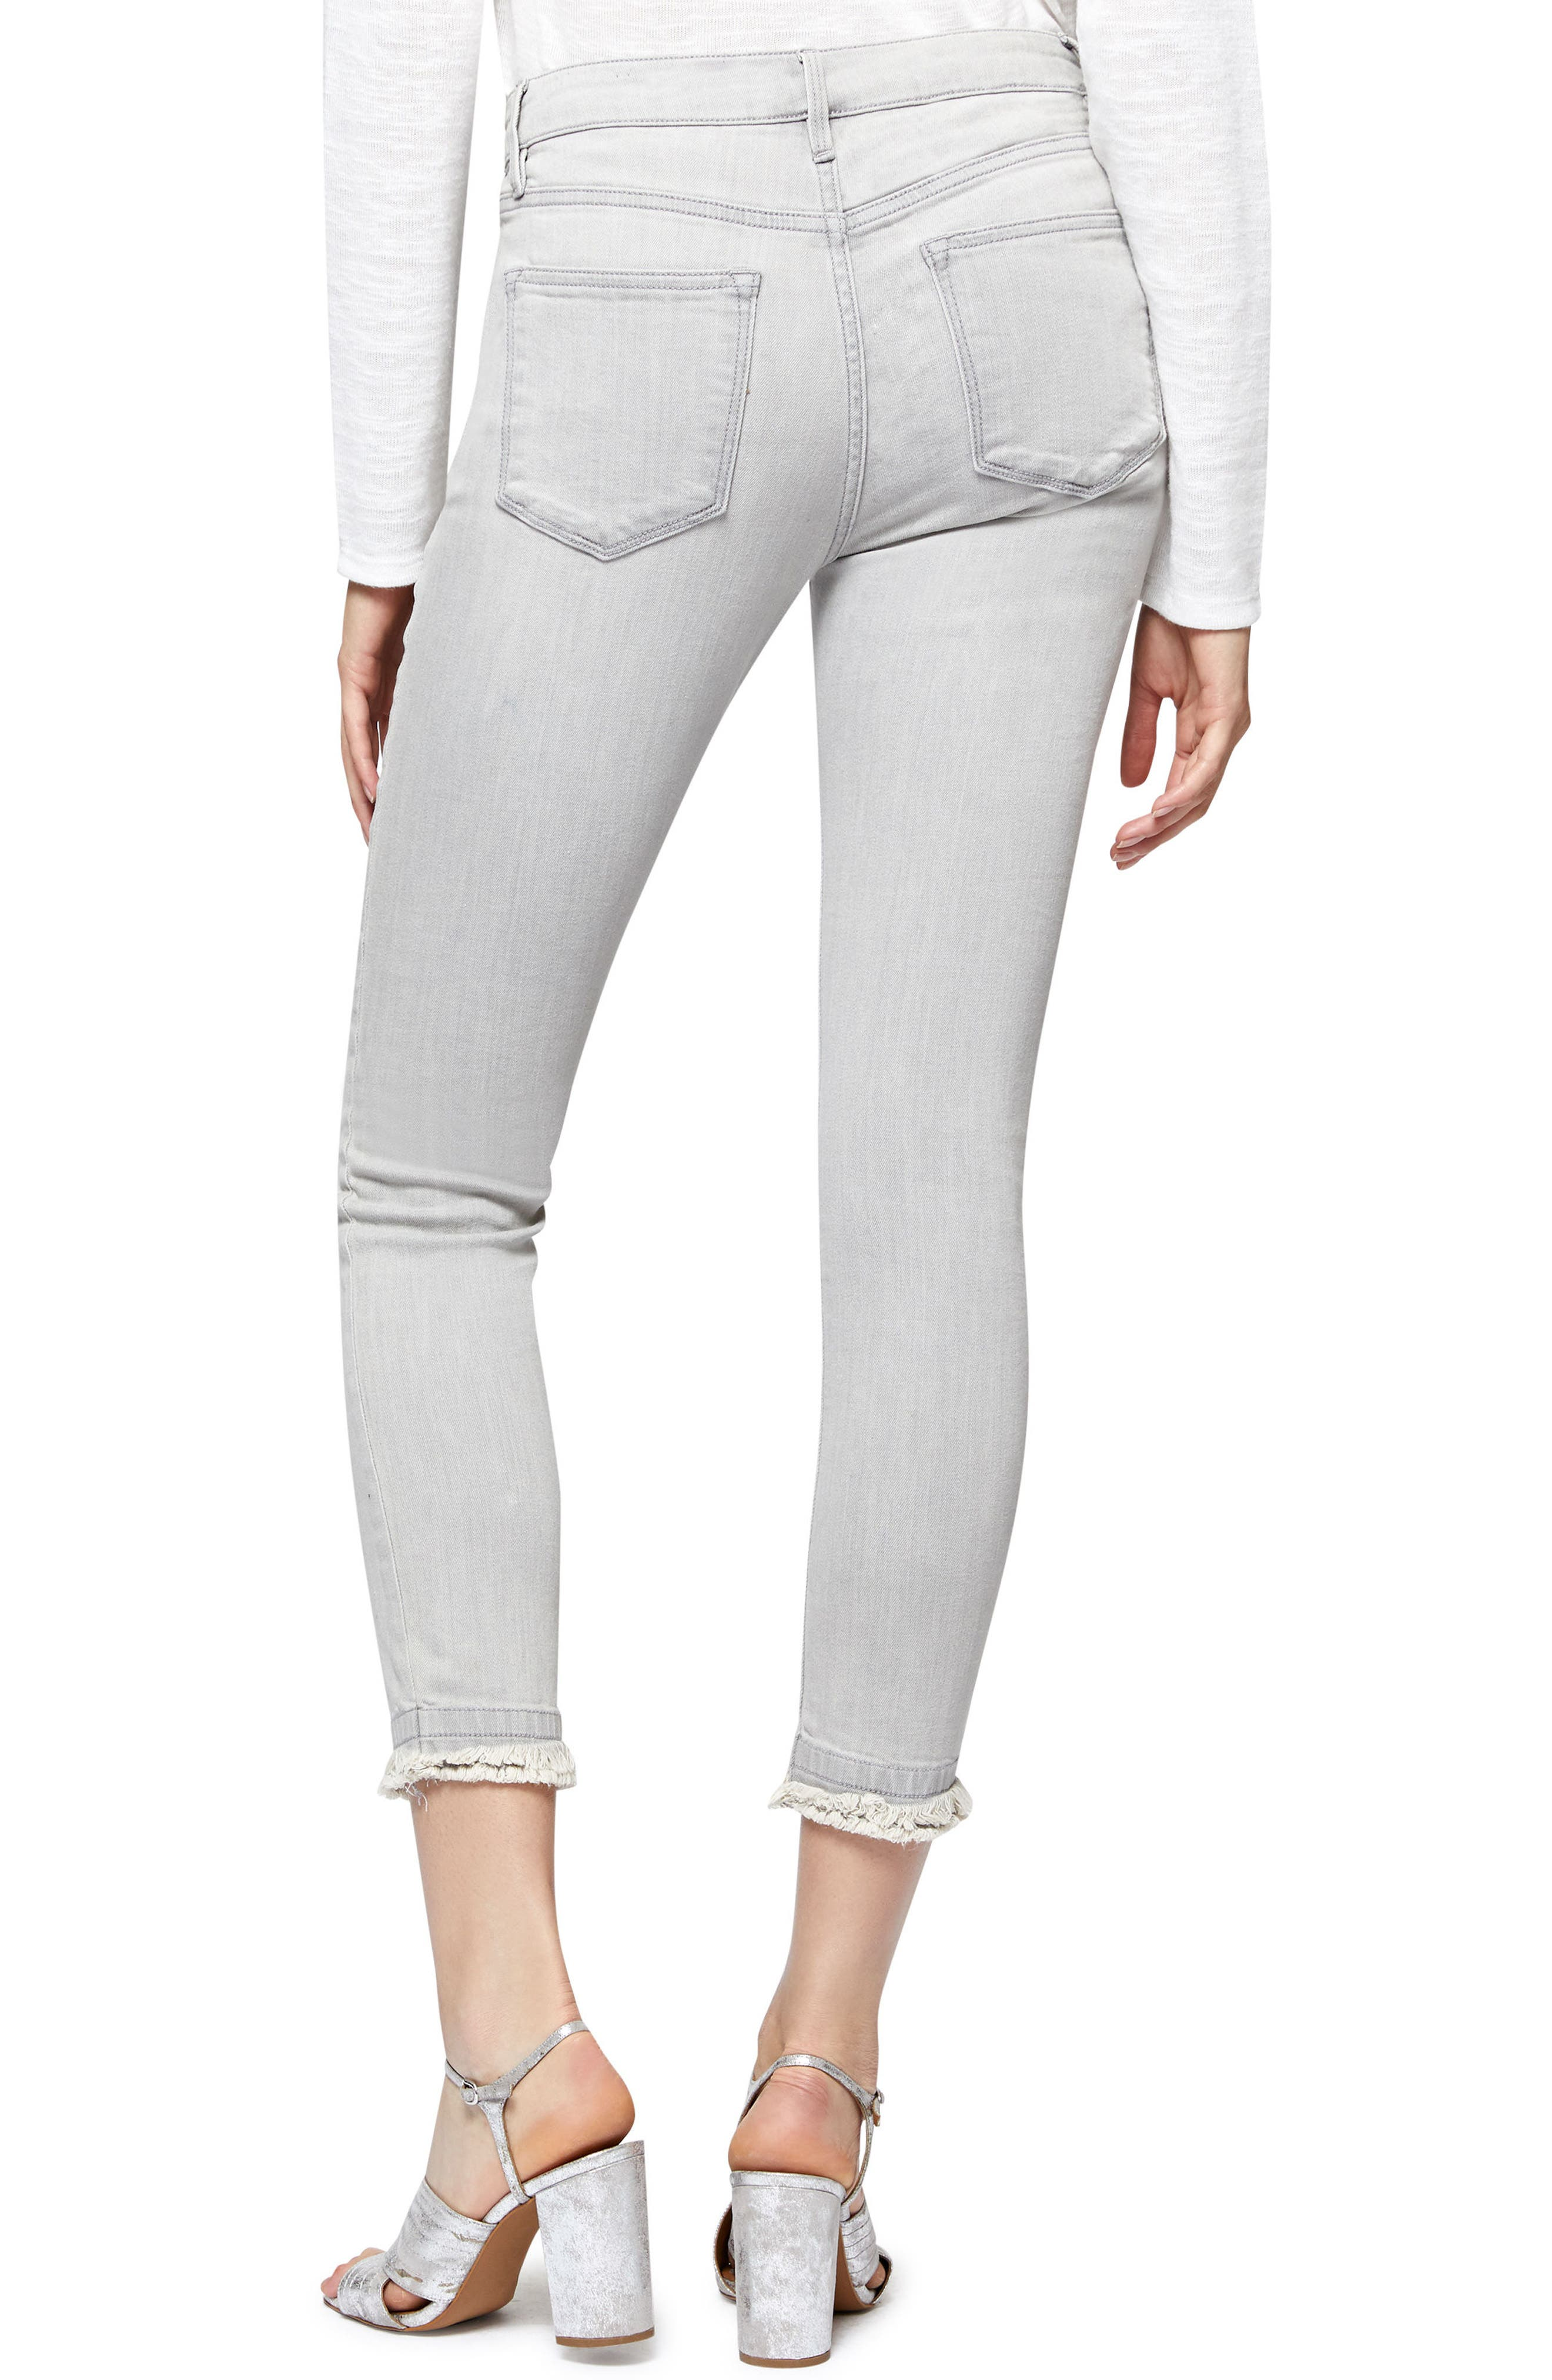 Saige Double Fray Ankle Jeans,                             Alternate thumbnail 2, color,                             Greyson